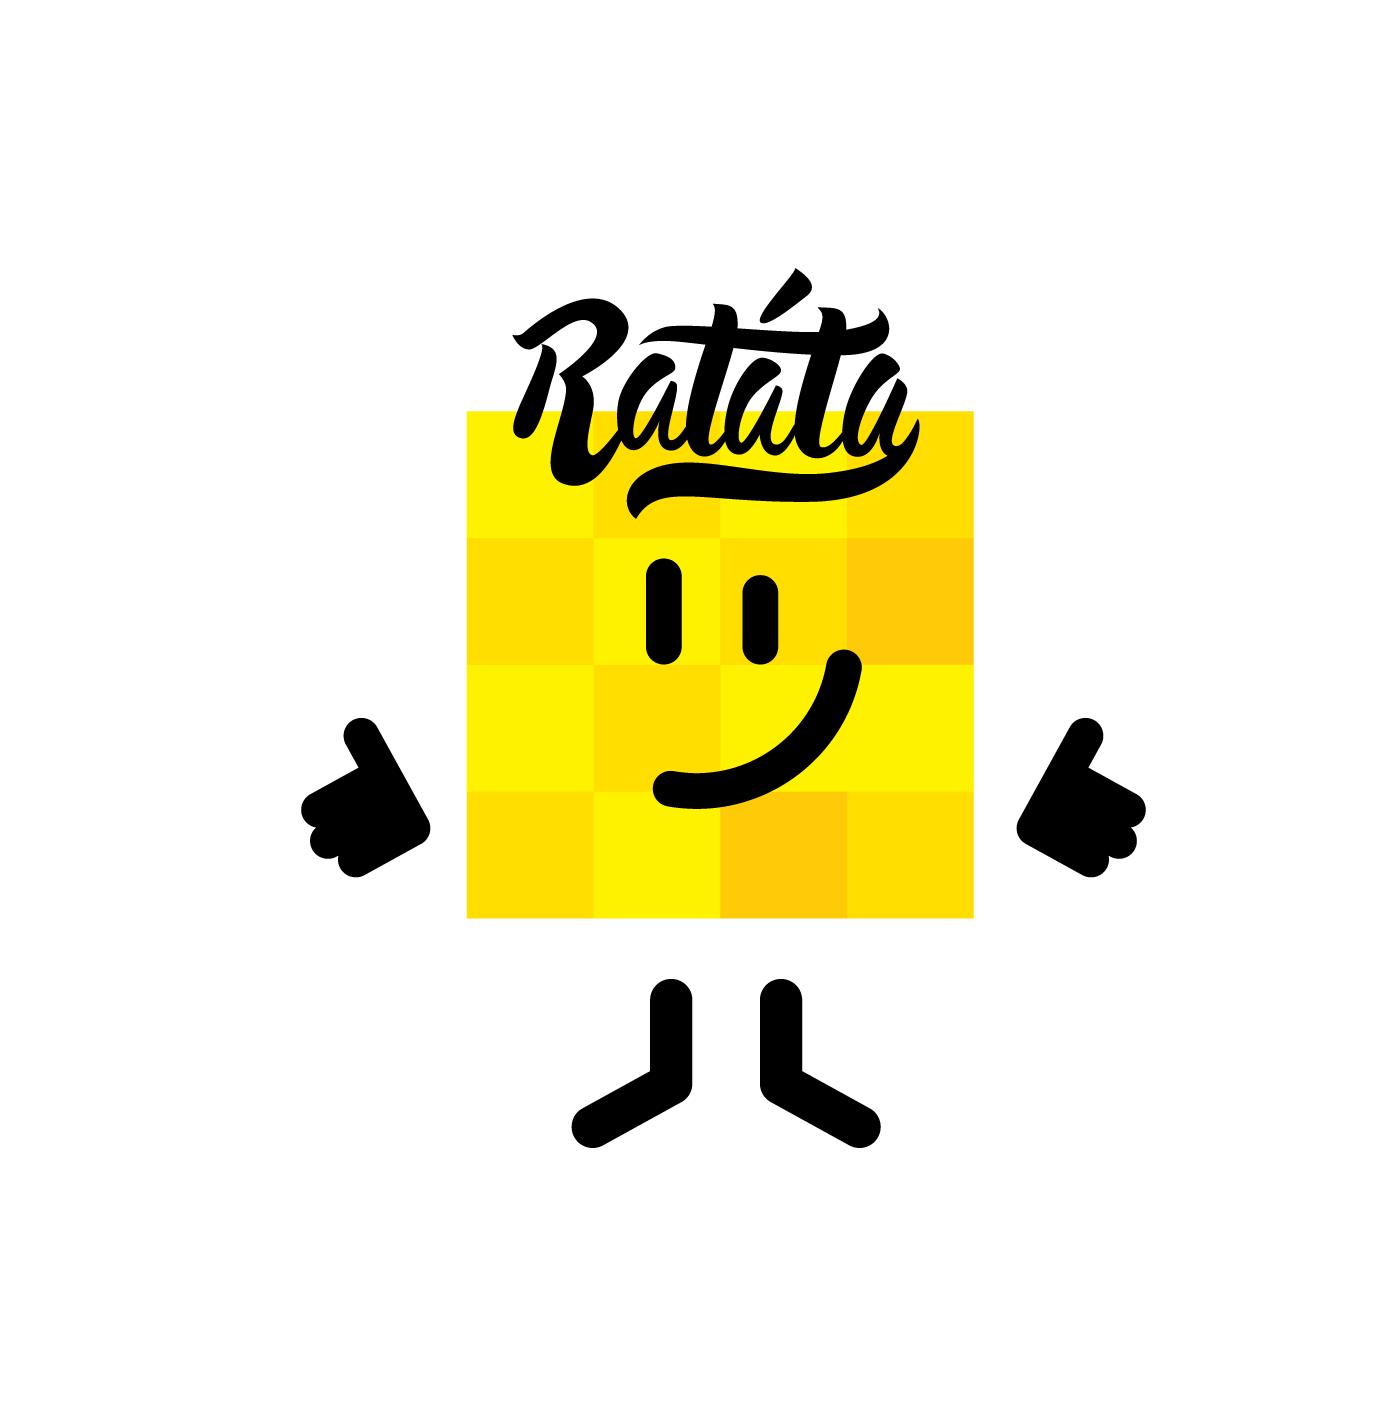 Создание бренд-персонажа Ratata